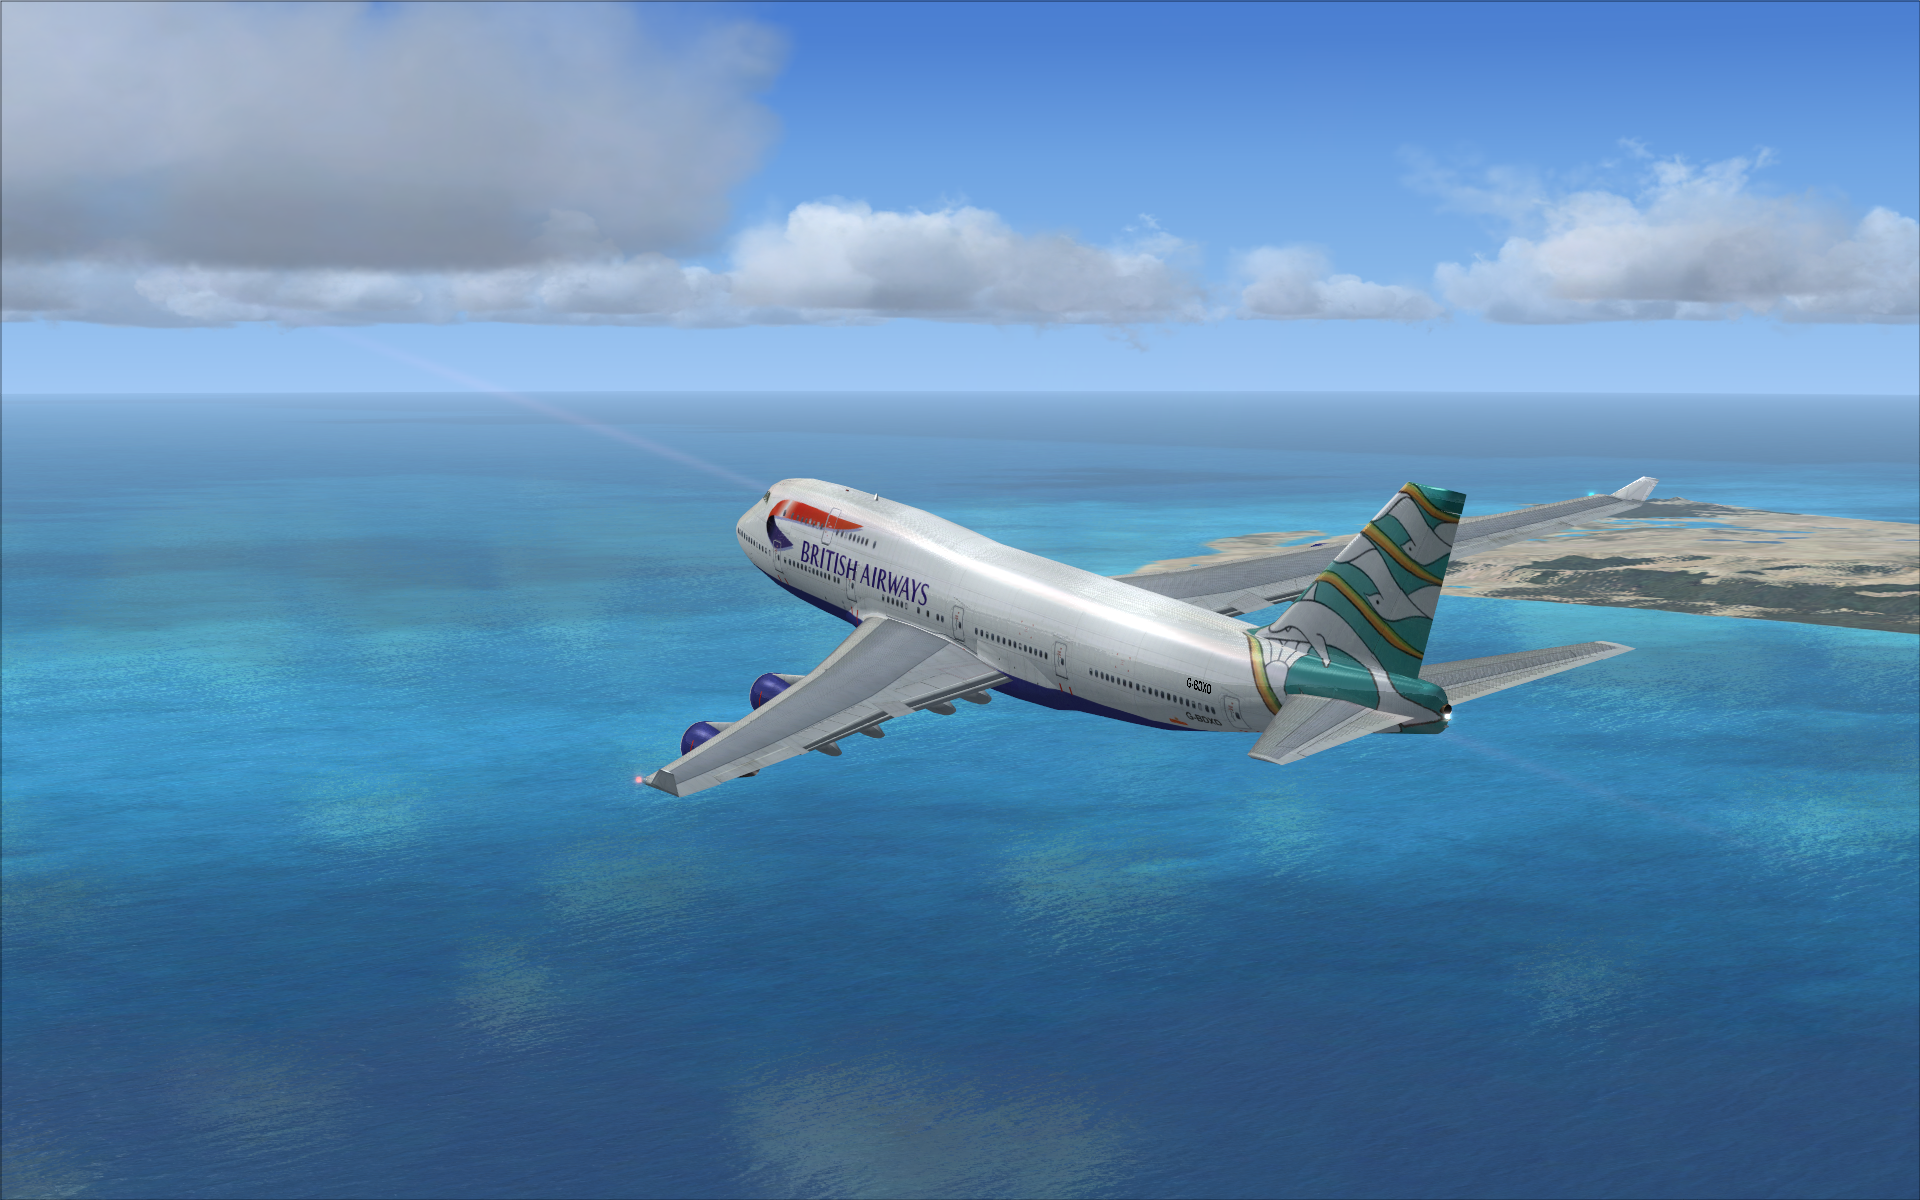 Flight Simulator X Deluxe wallpaper 1920x1200